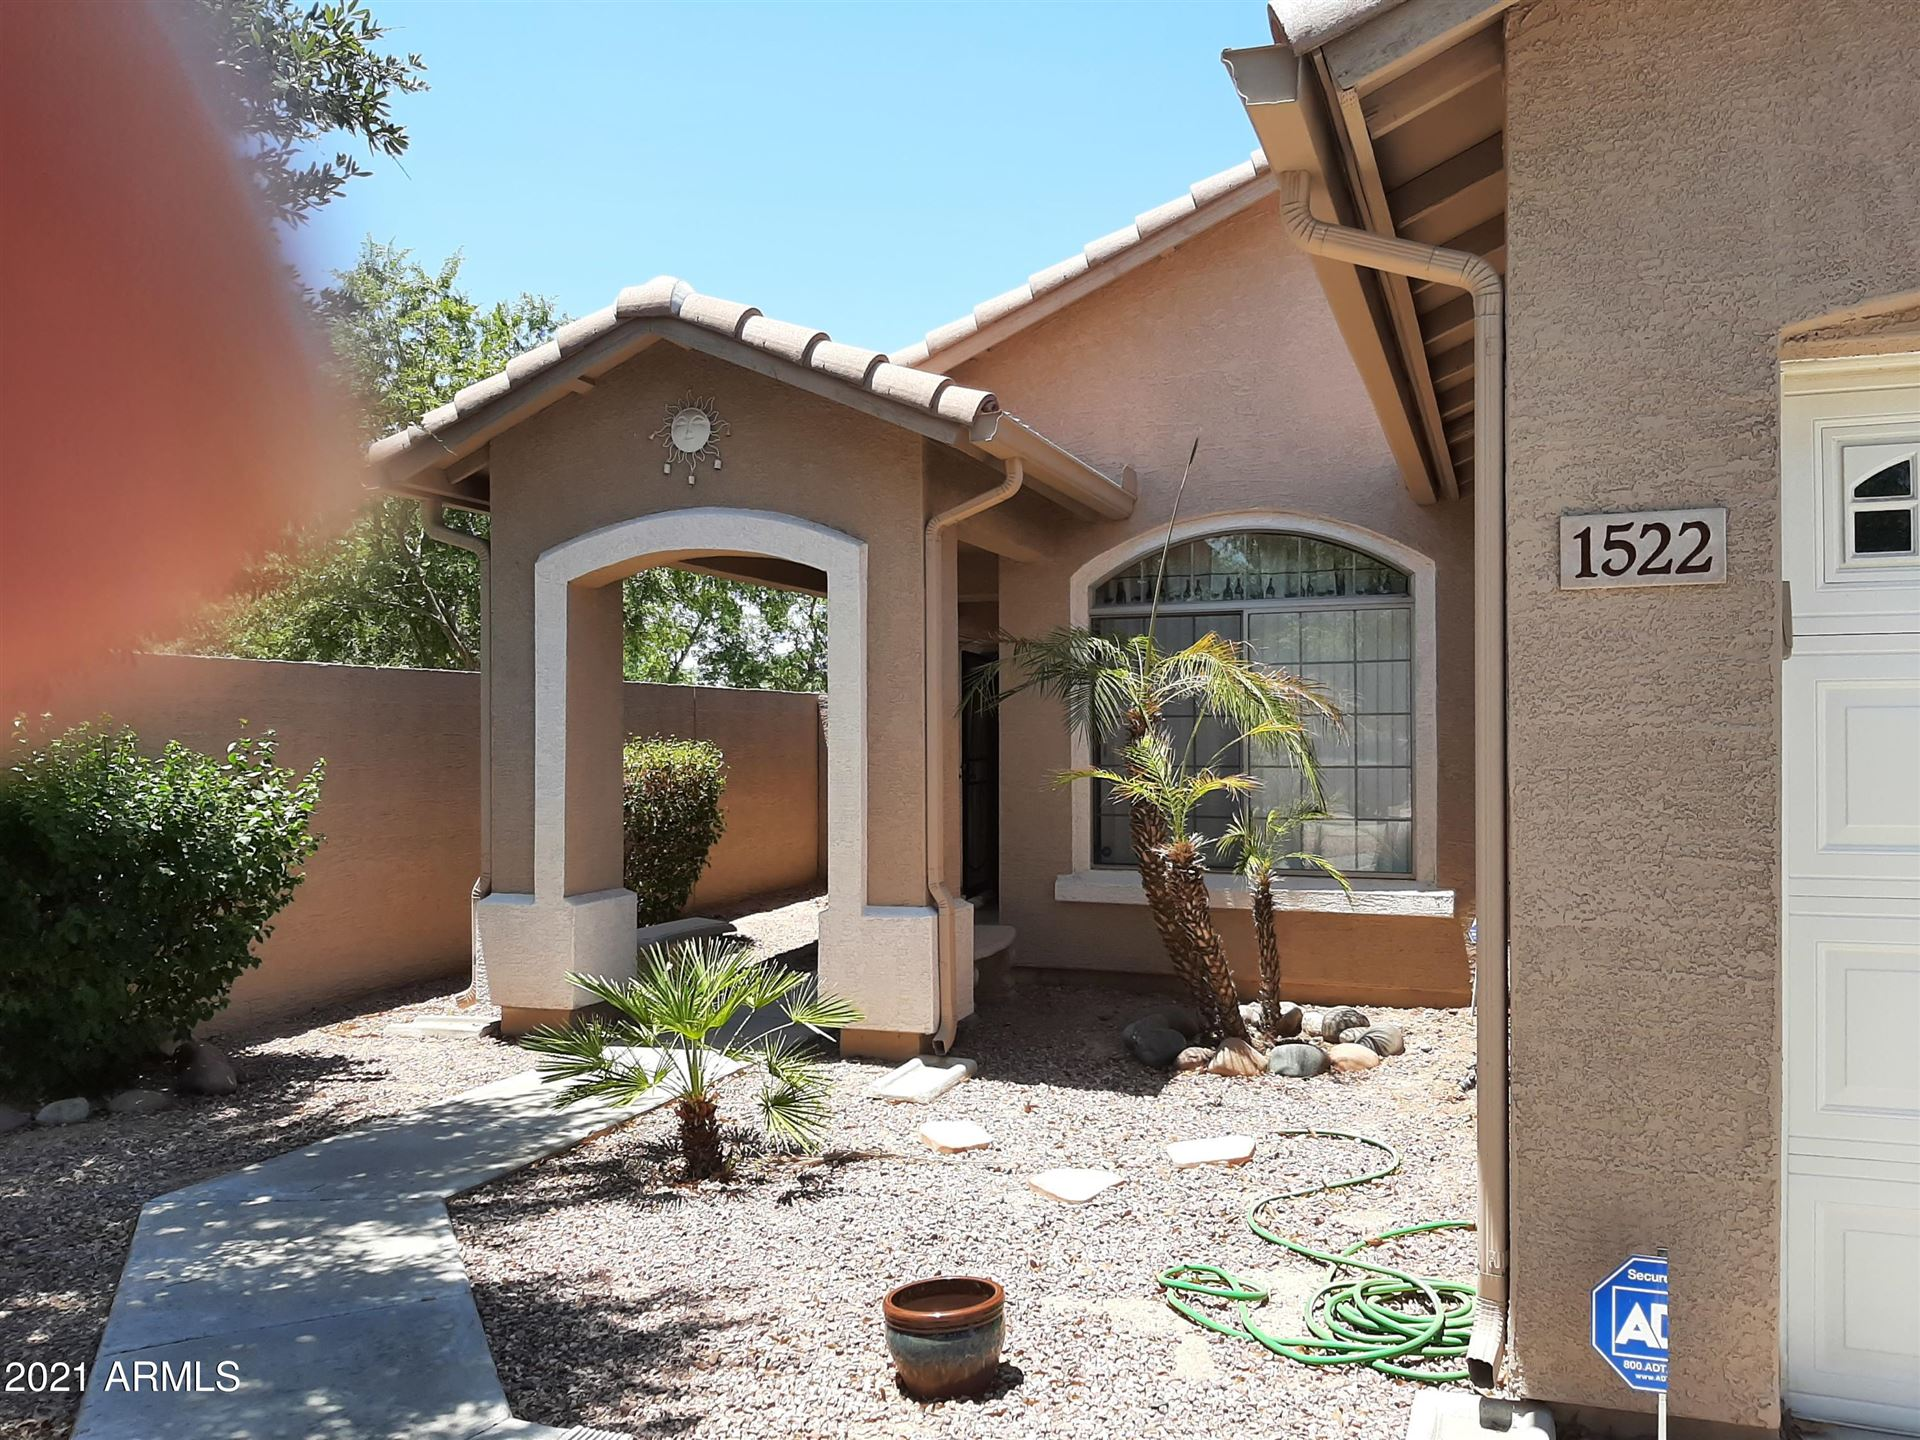 Photo of 1522 S 84TH Avenue, Tolleson, AZ 85353 (MLS # 6262936)